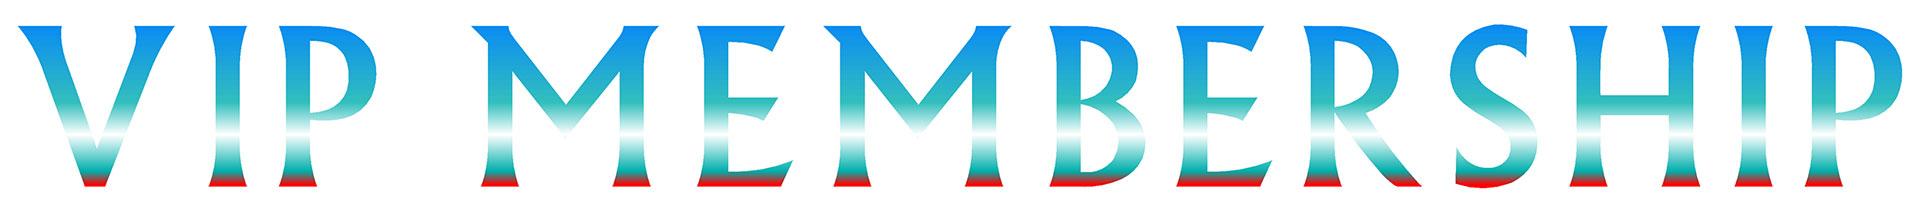 Proshin VIP logo